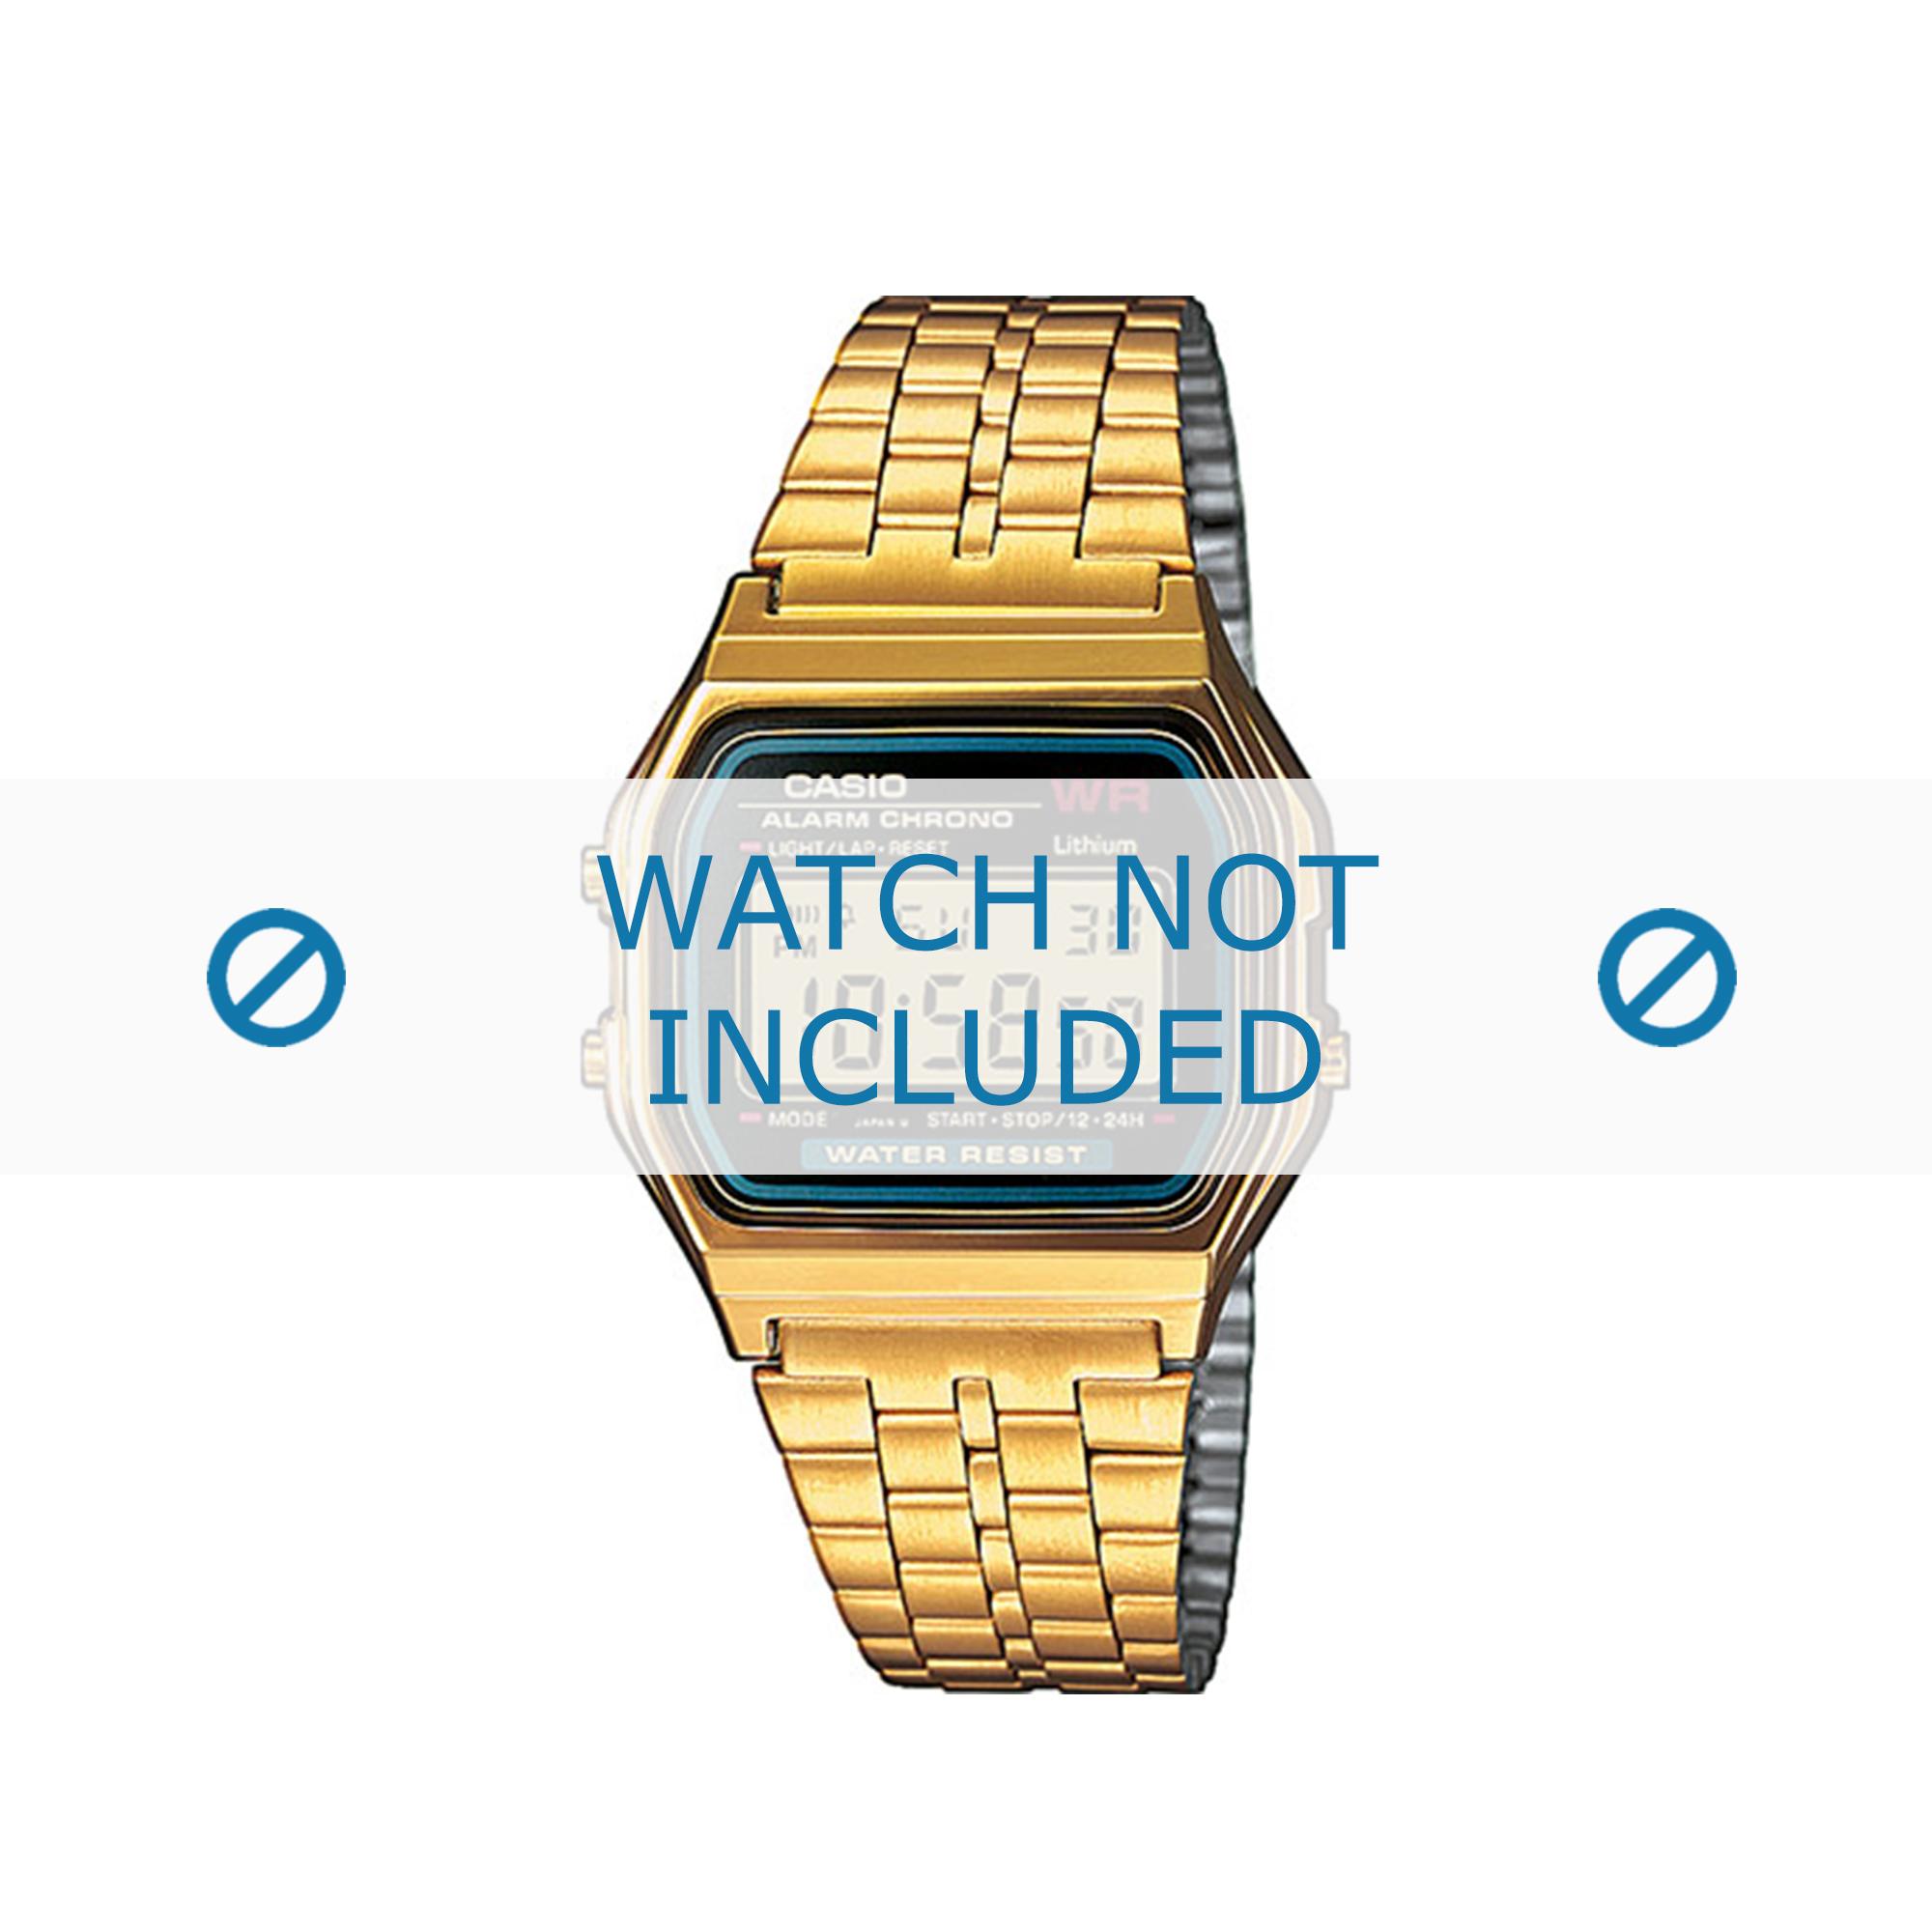 Casio horlogeband A159WGEA-1EF / A159WGEA-1 Staal Goud (Doublé) 18mm